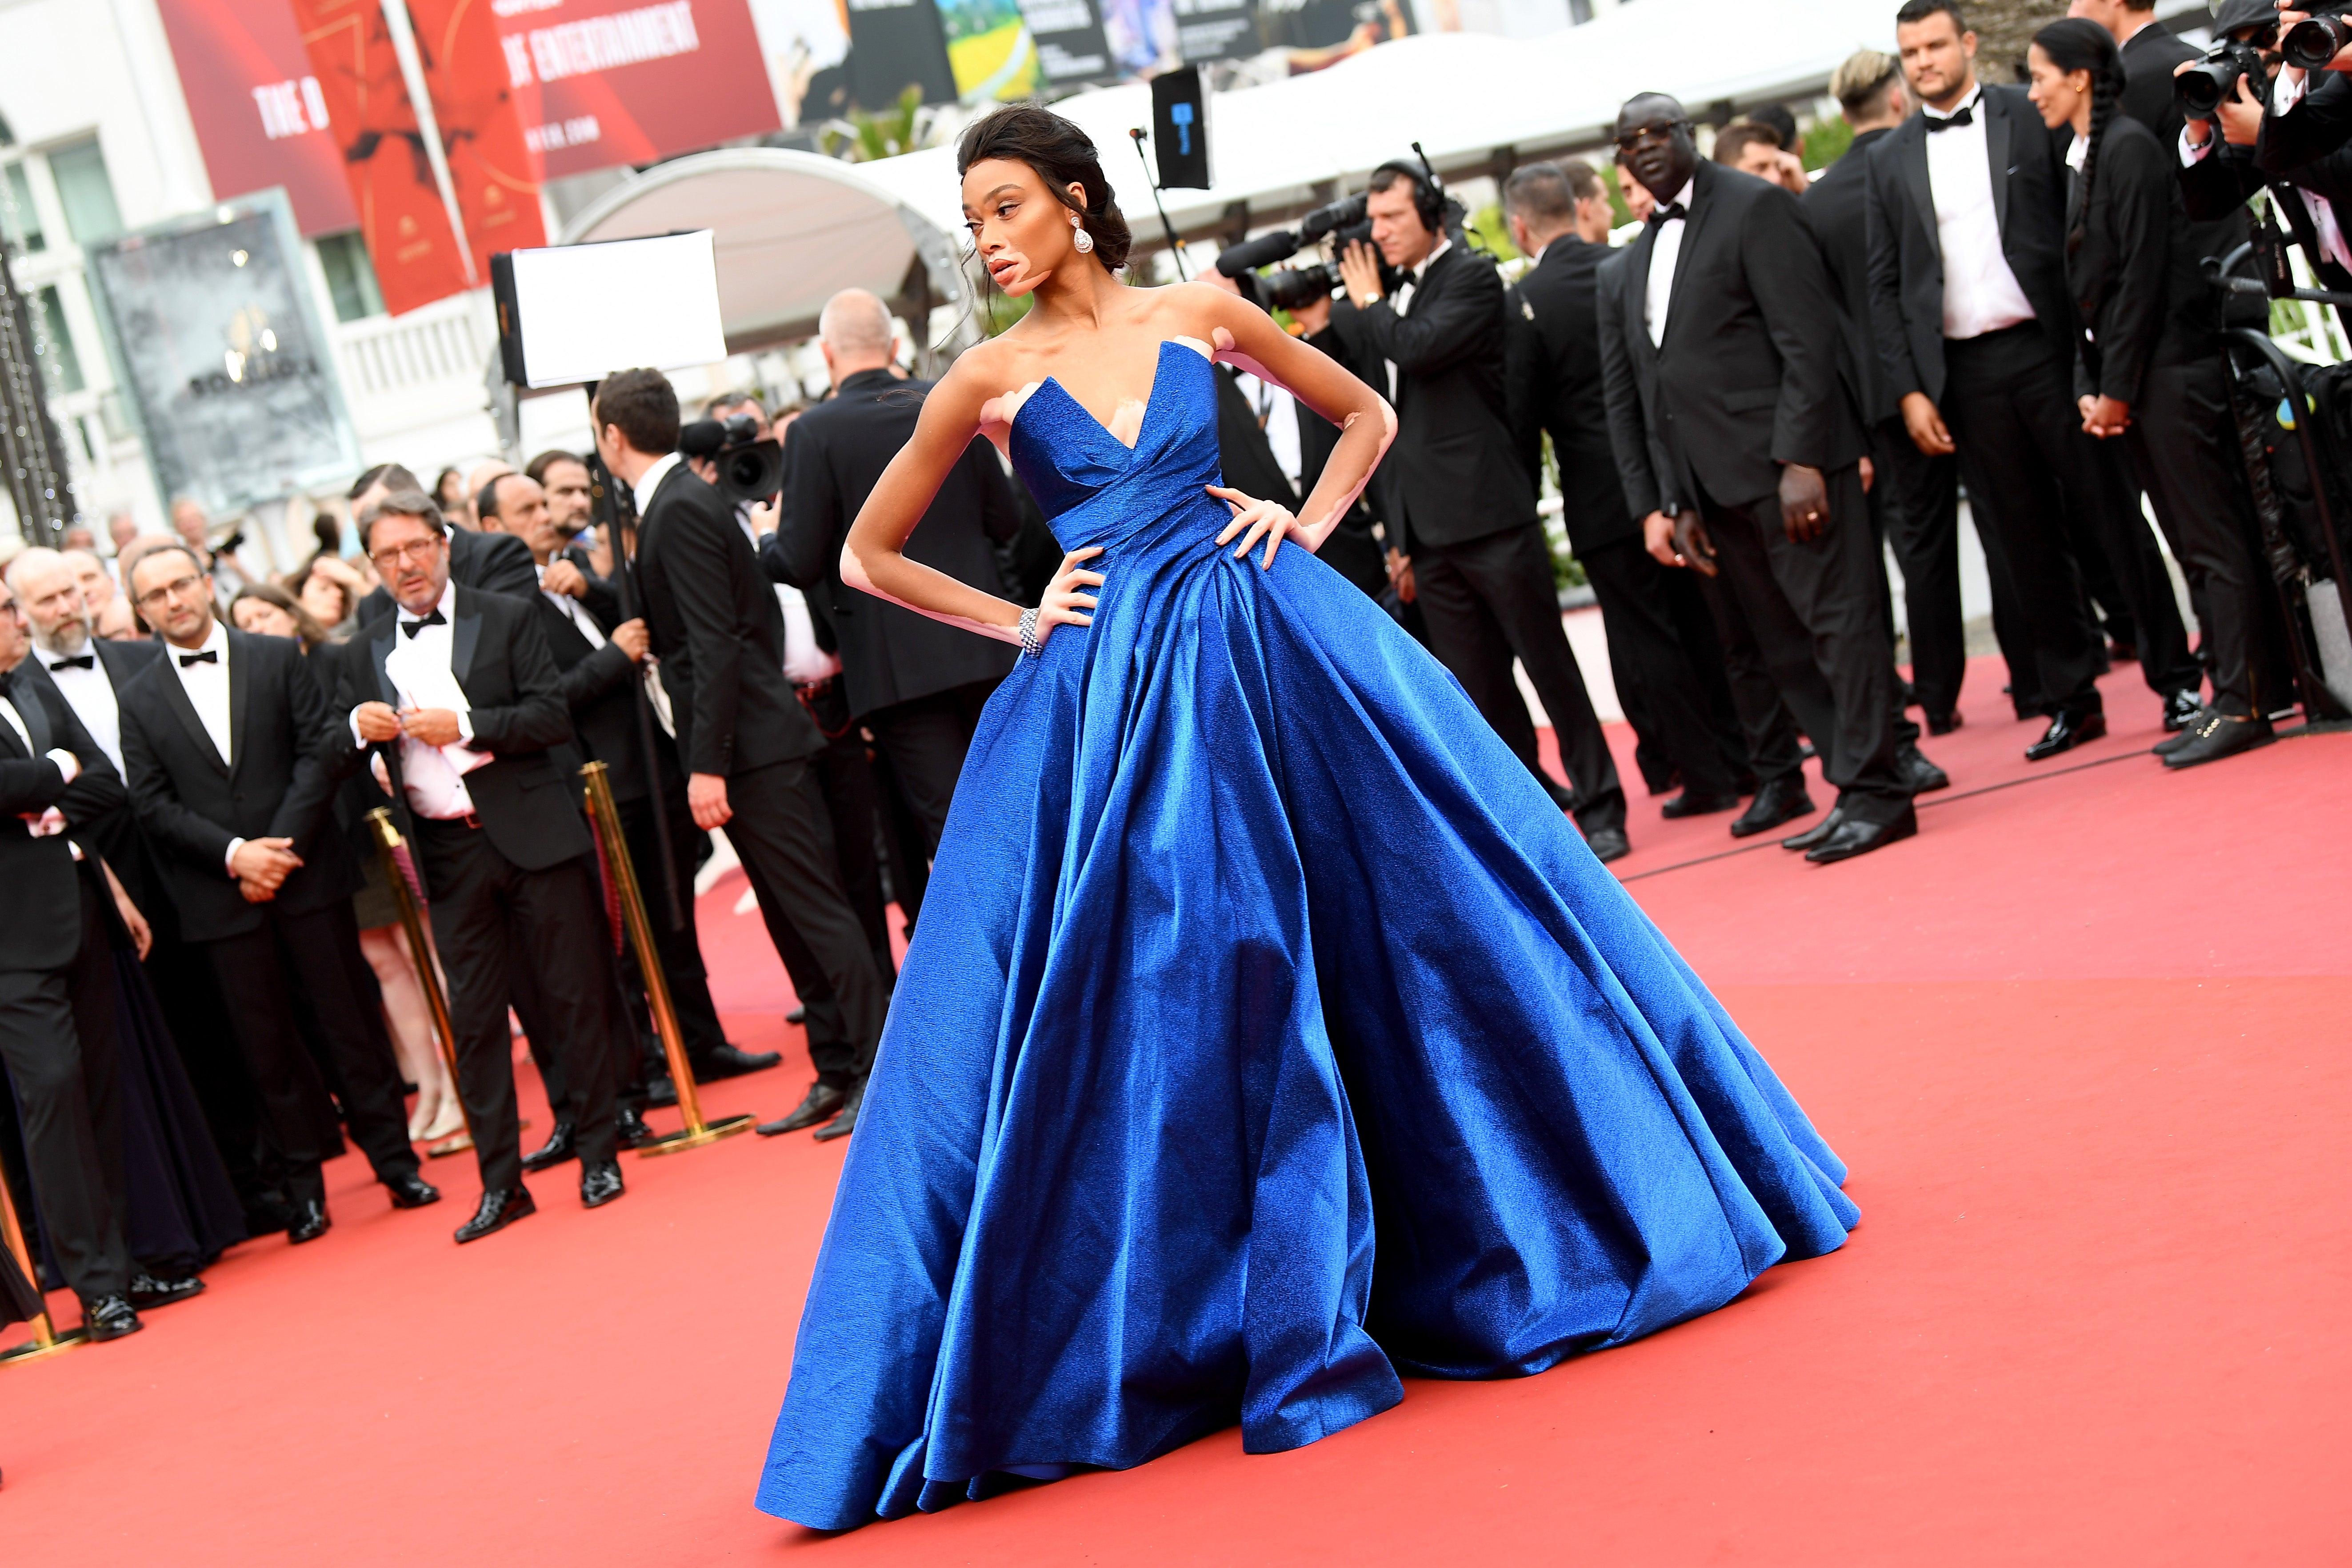 Winnie Harlow Just Shut Down the 2017 Cannes Film Festival Red Carpet